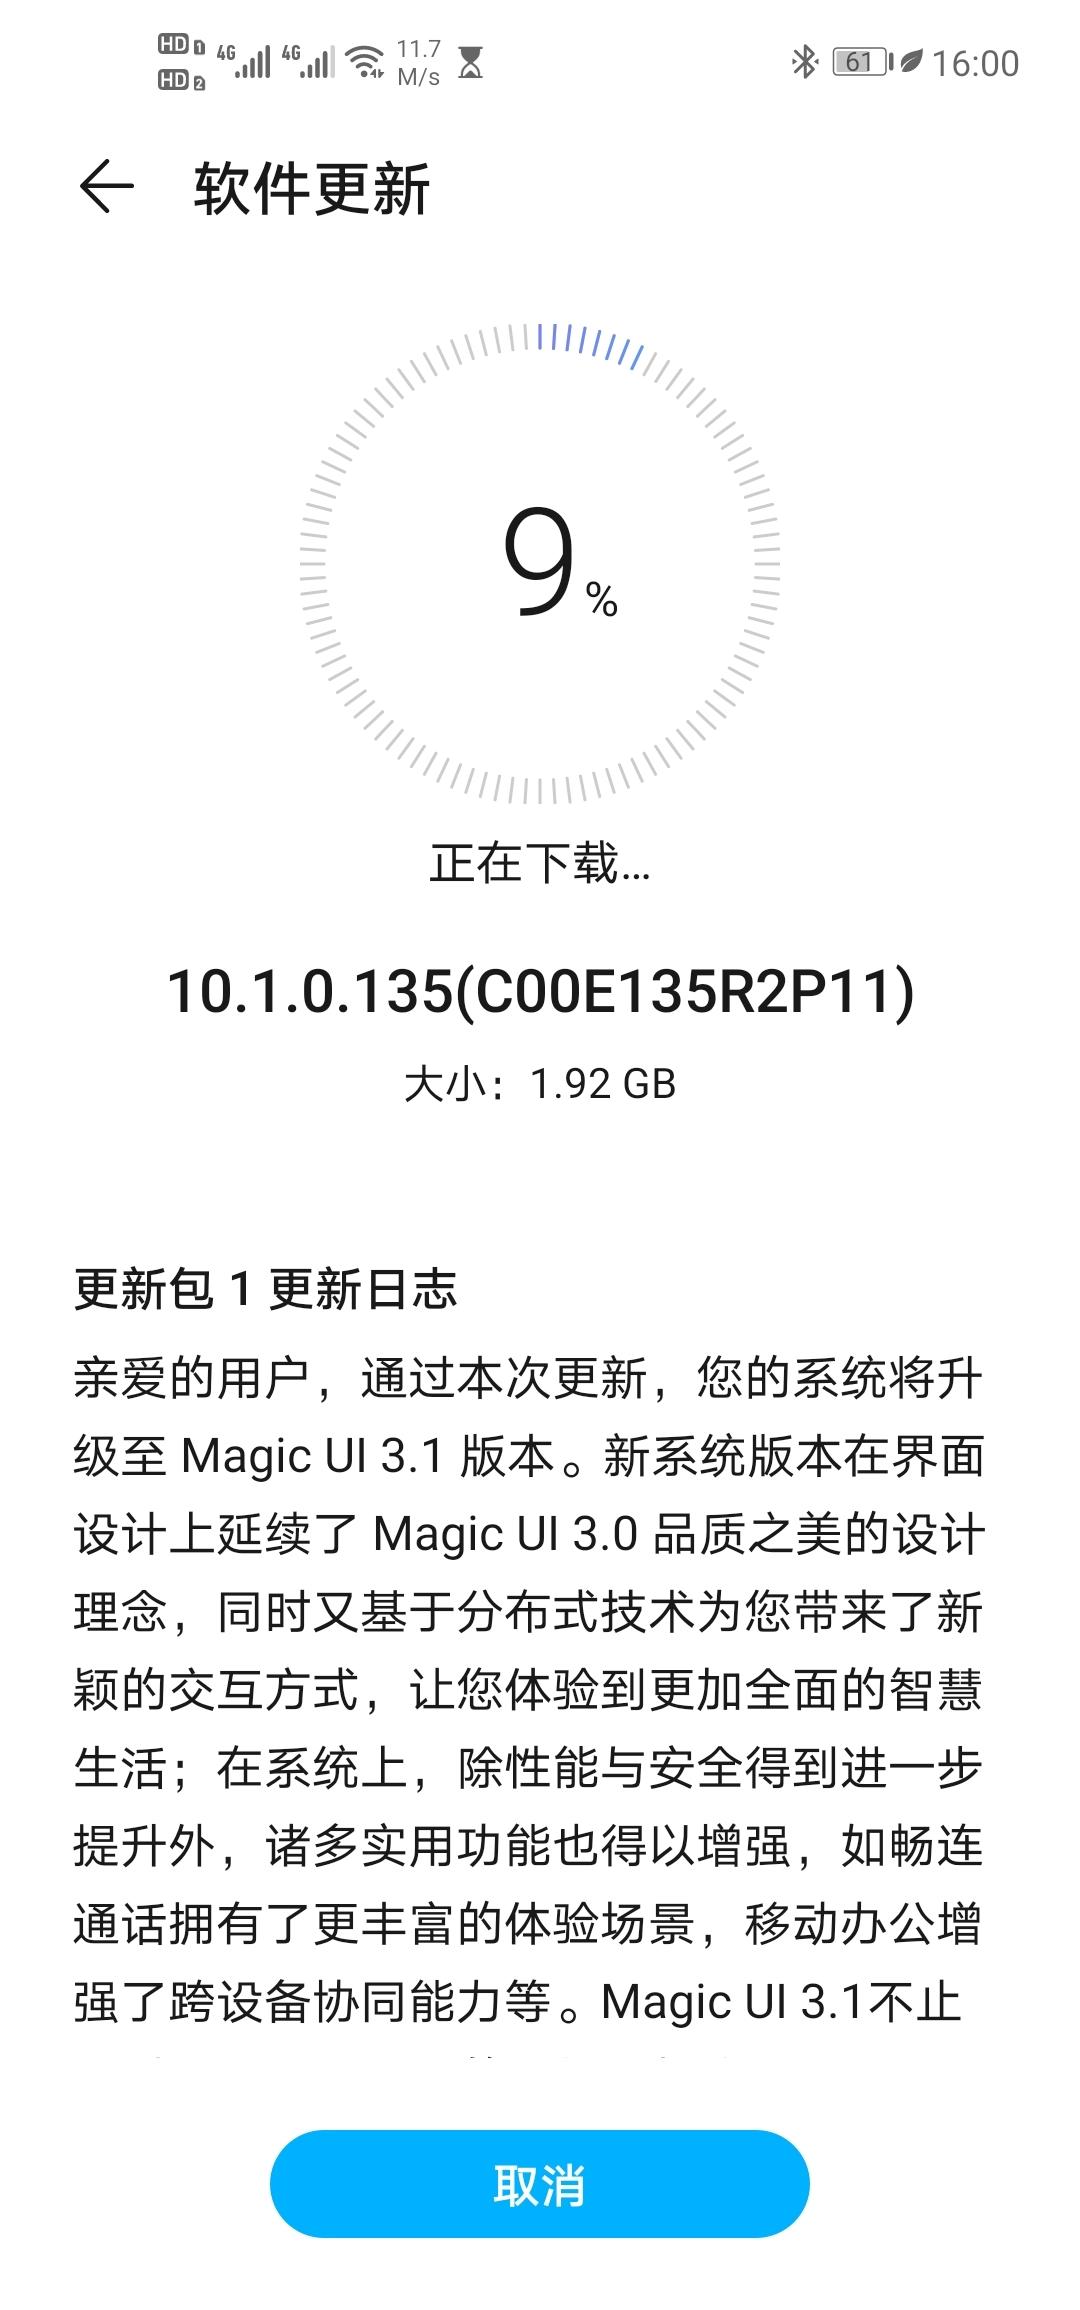 Screenshot_20200514_160016_com.huawei.android.hwouc.jpg